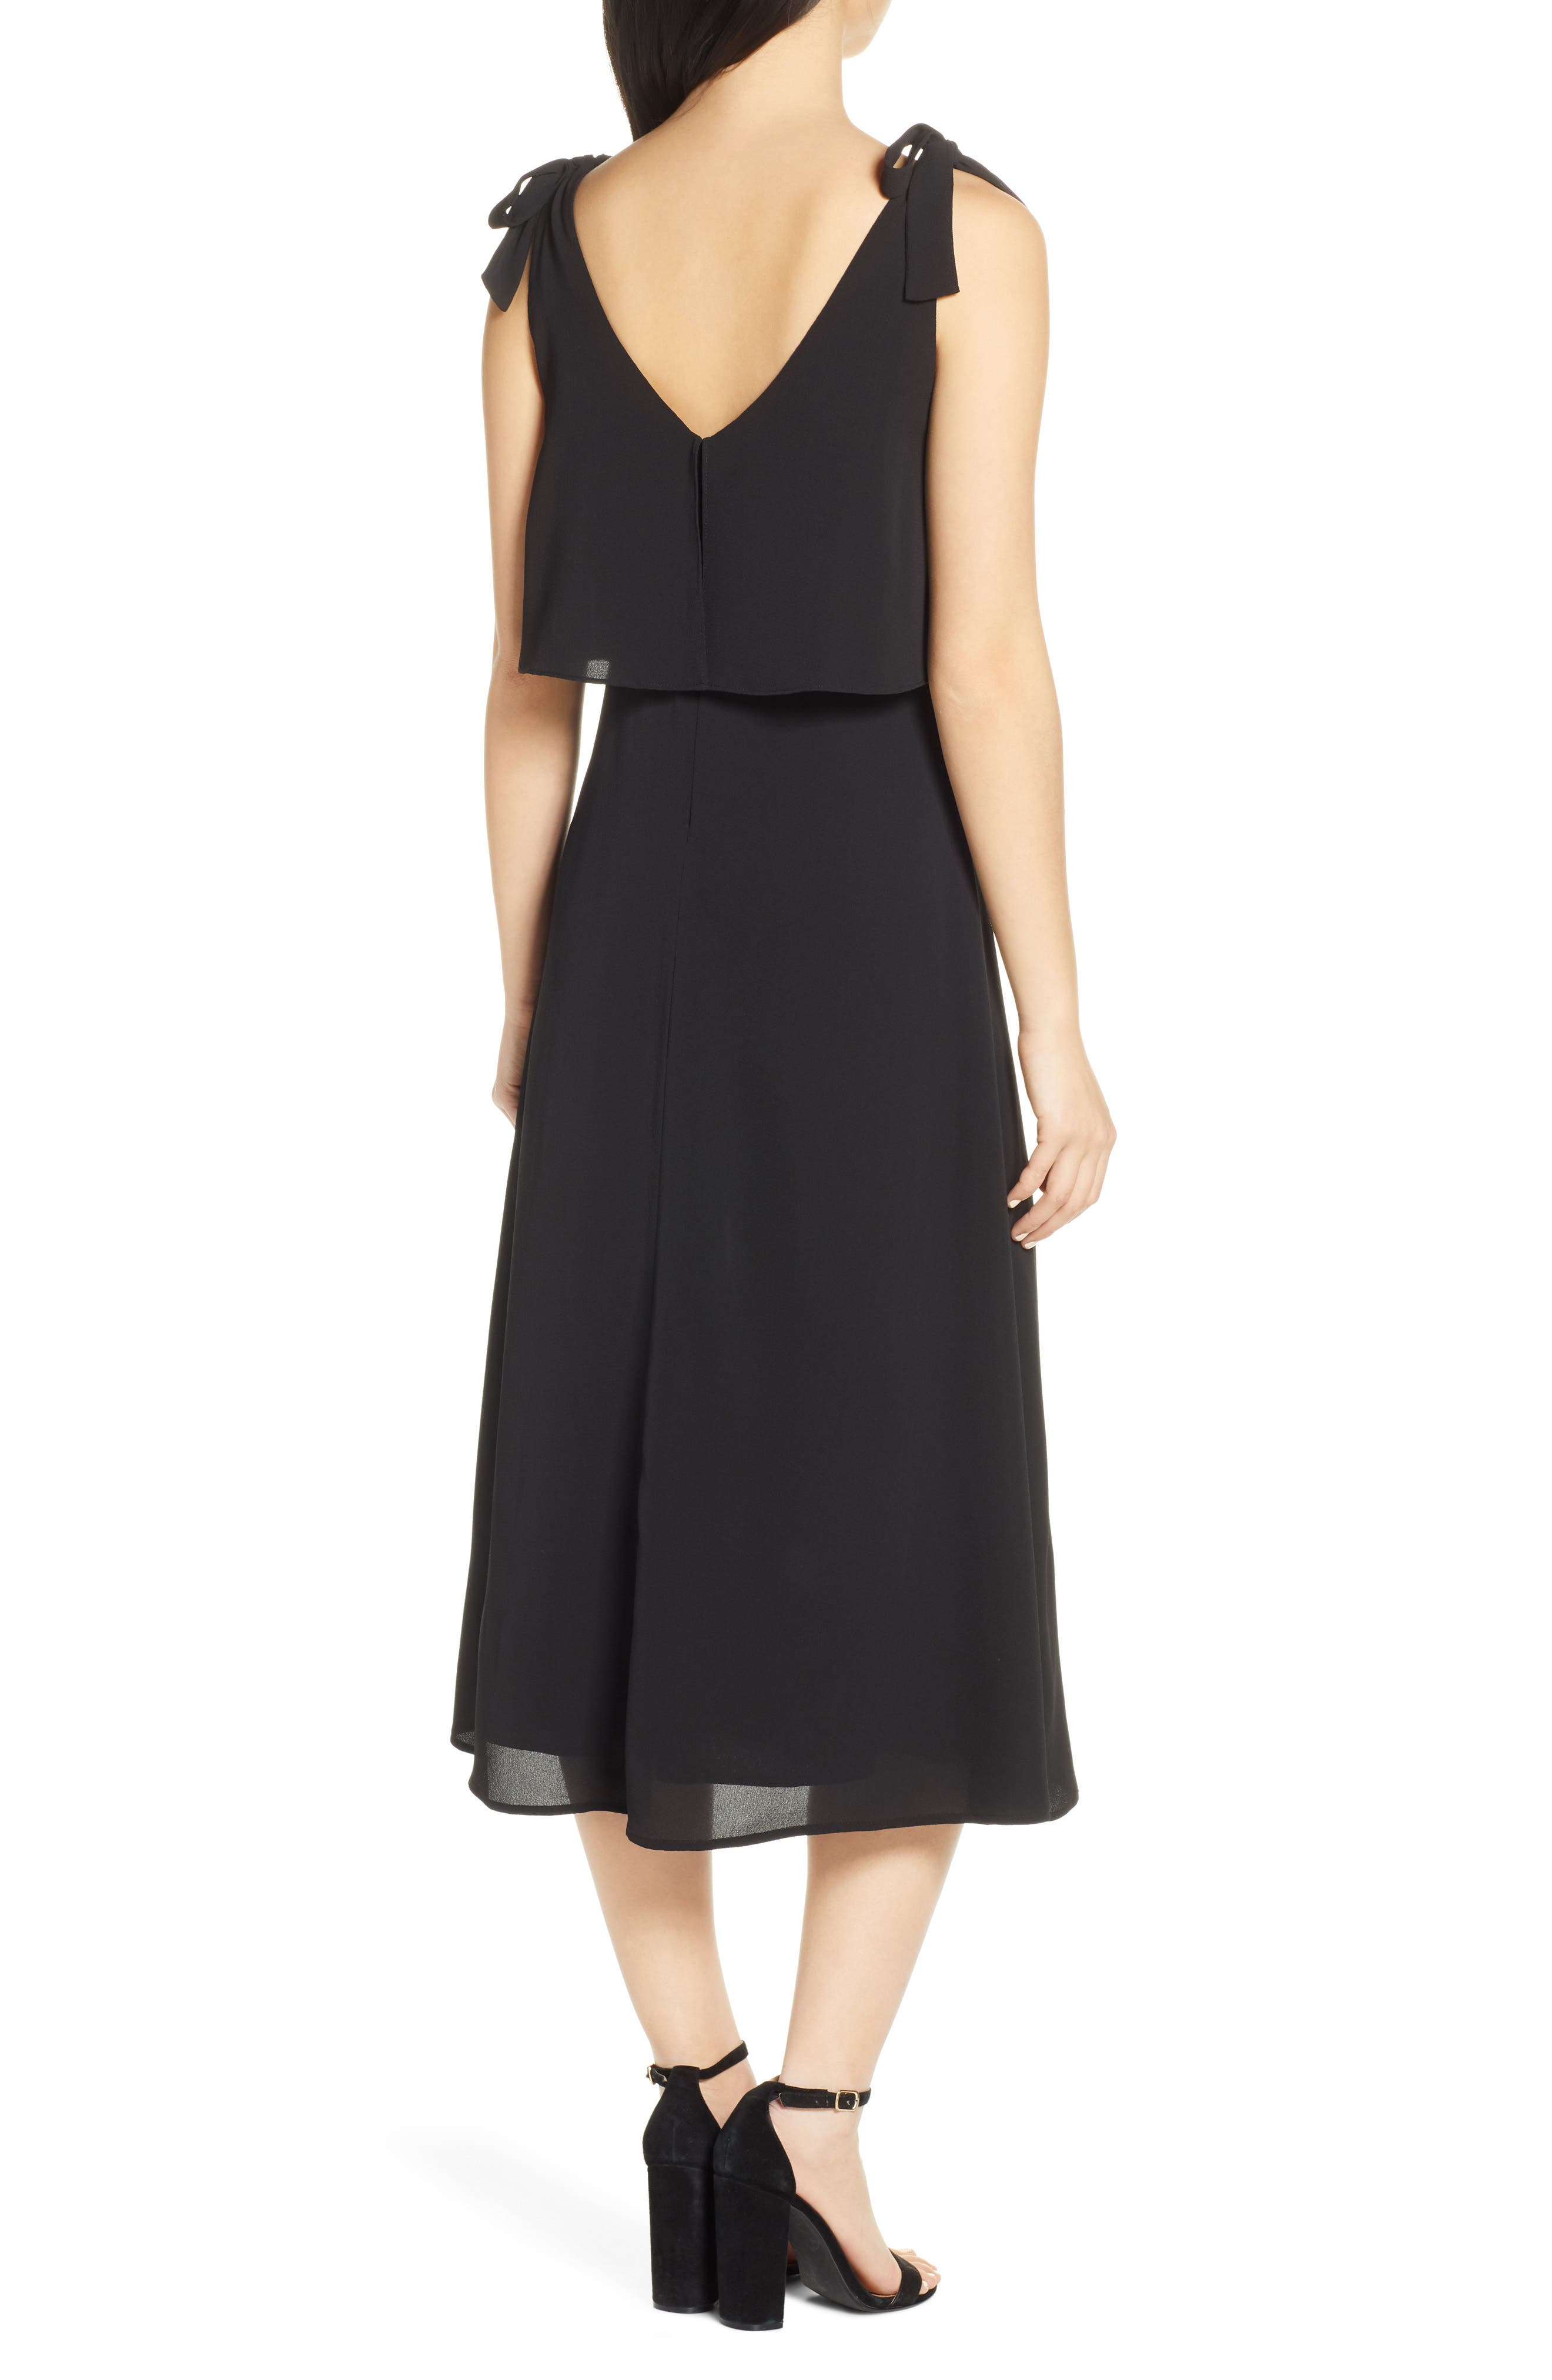 CHARLES HENRY, Tie Shoulder Popover Midi Dress, Alternate thumbnail 2, color, BLACK